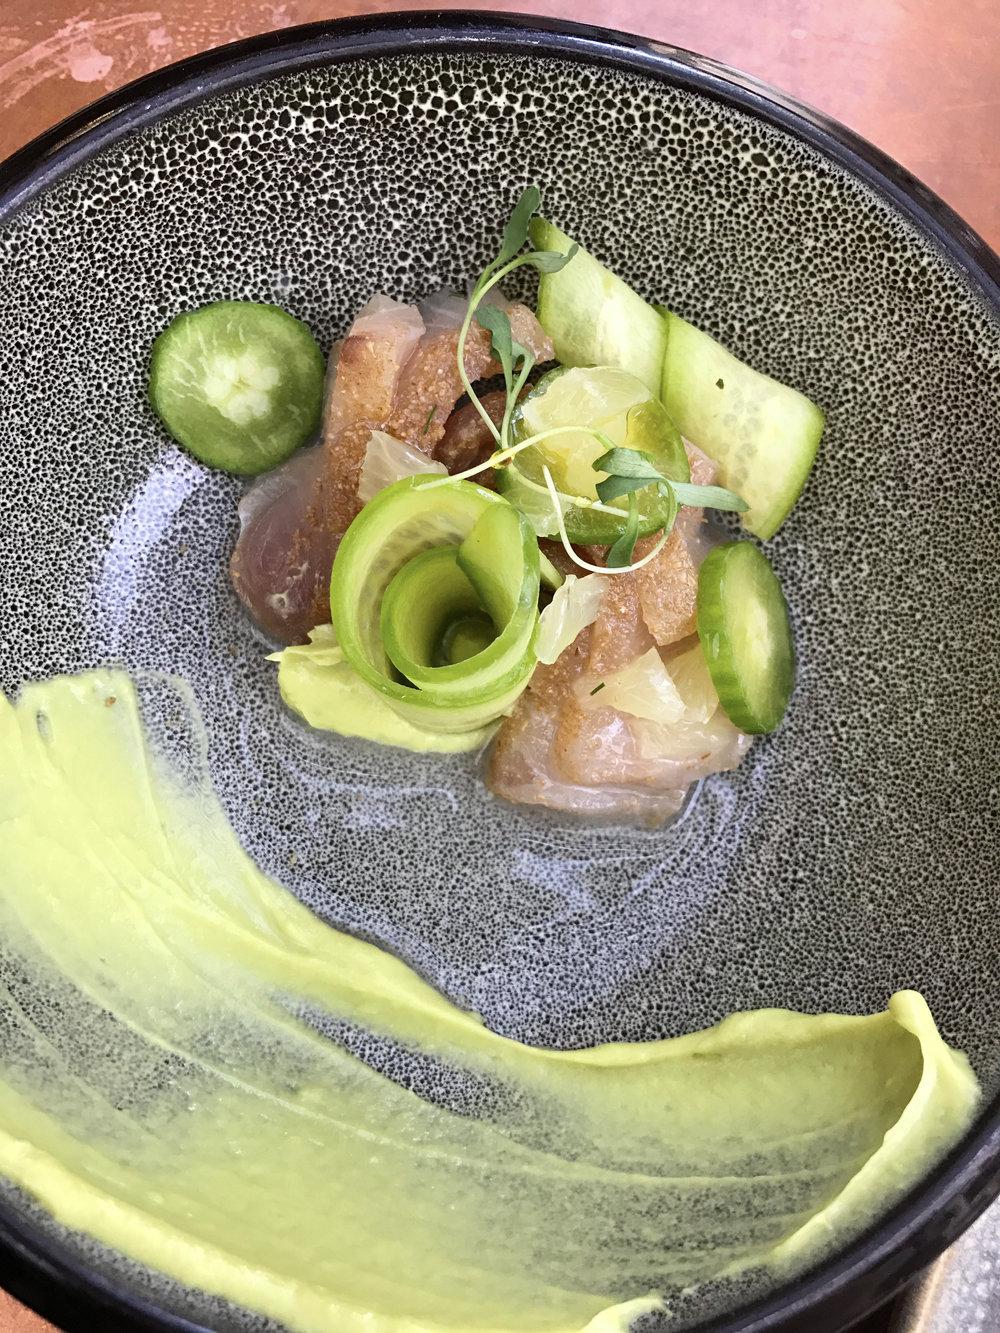 Hamachi with coriander, avocado, lemon, and dill